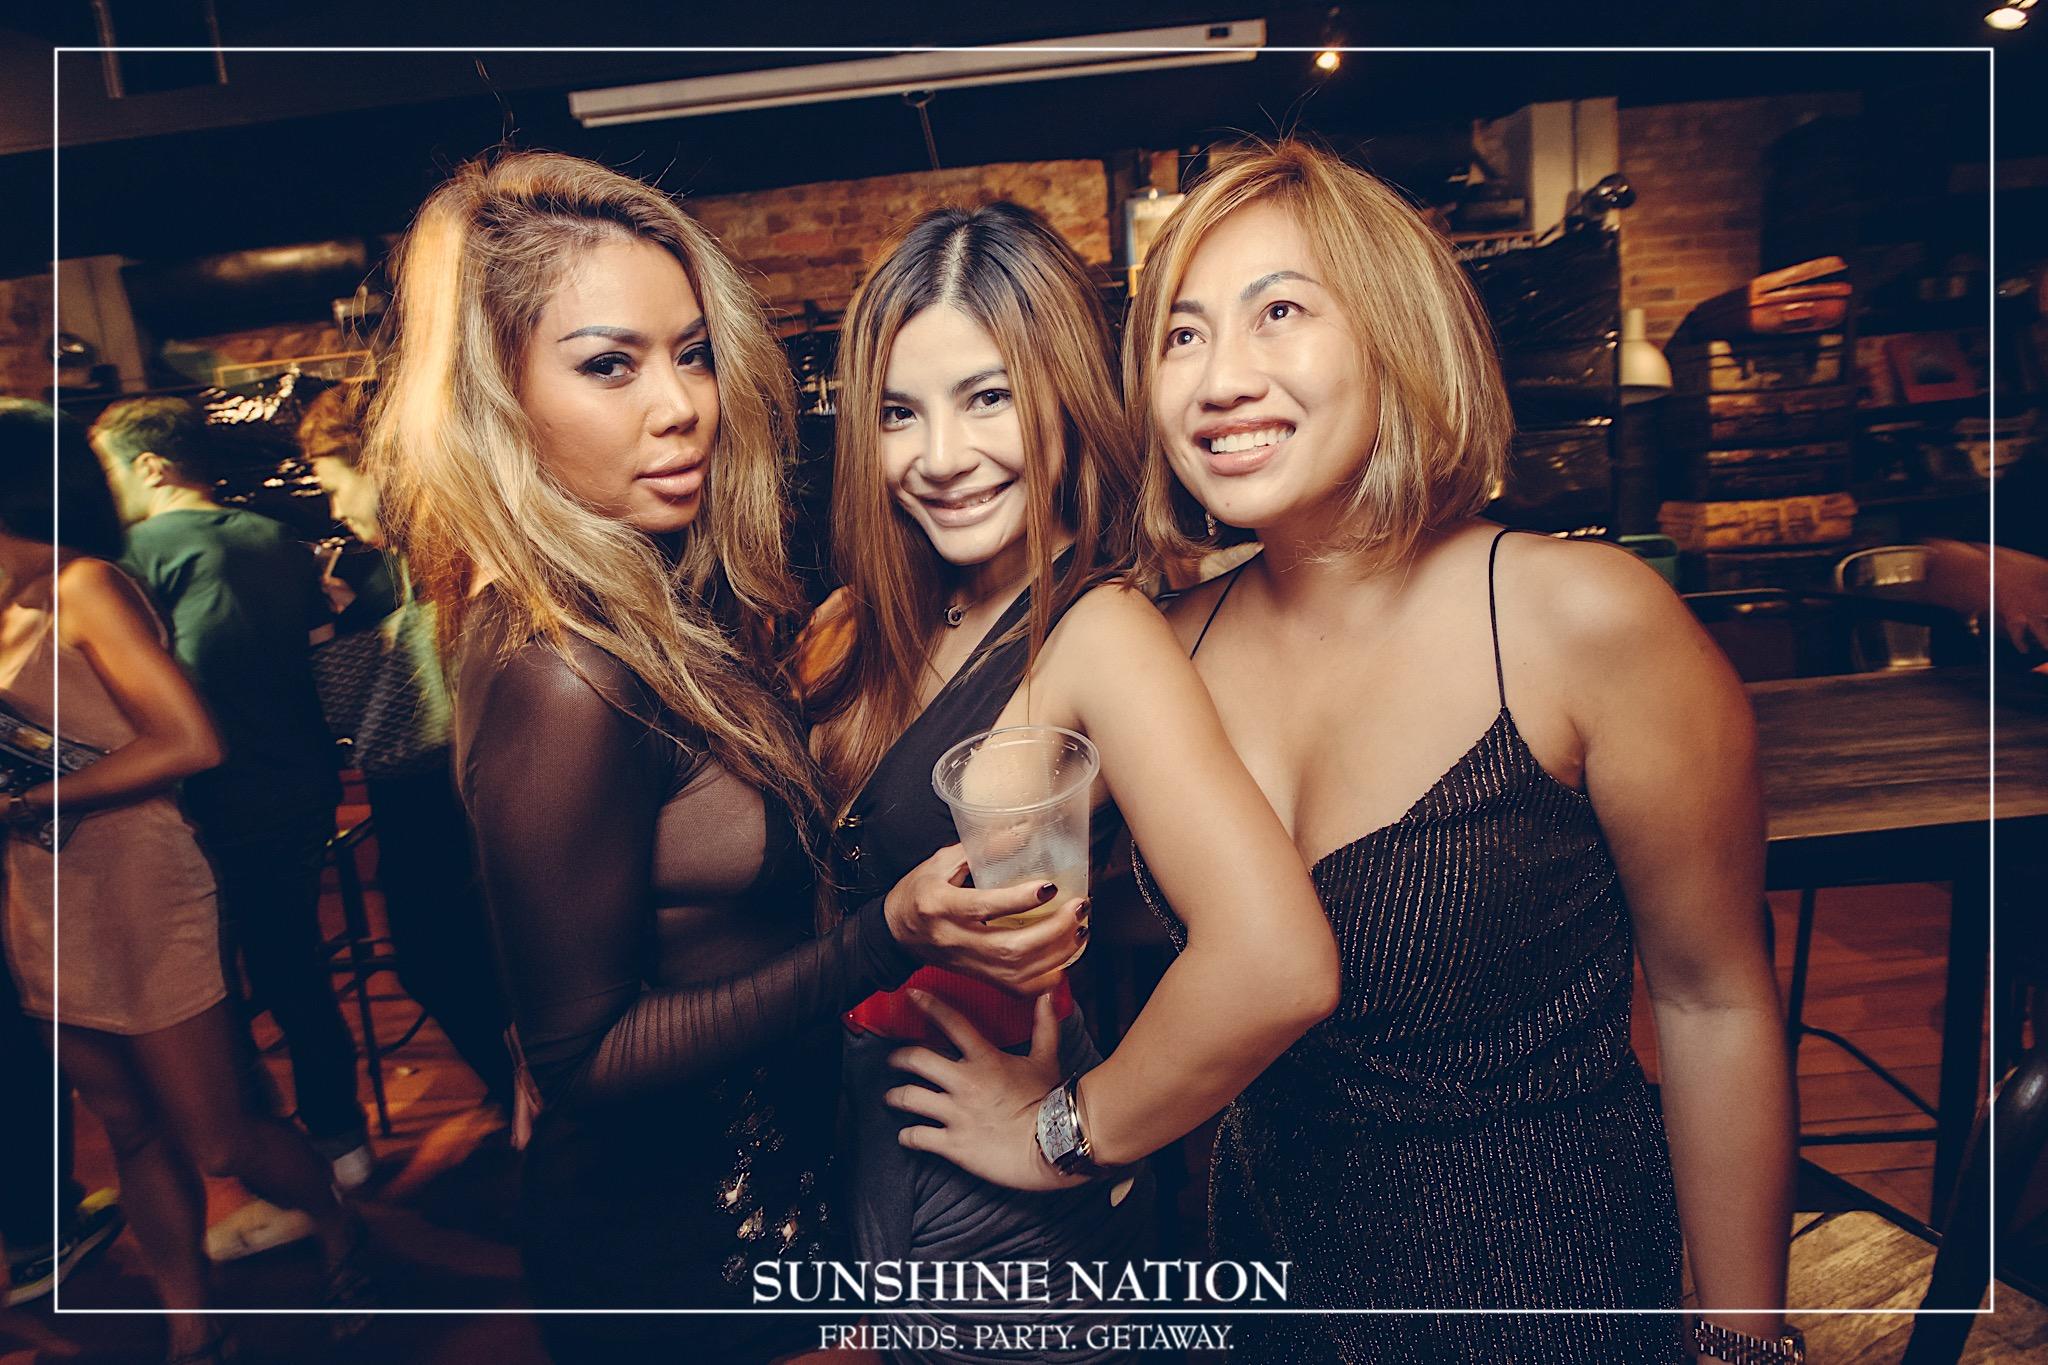 16092016_SunshineNation_Colossal023_Watermarked.jpg